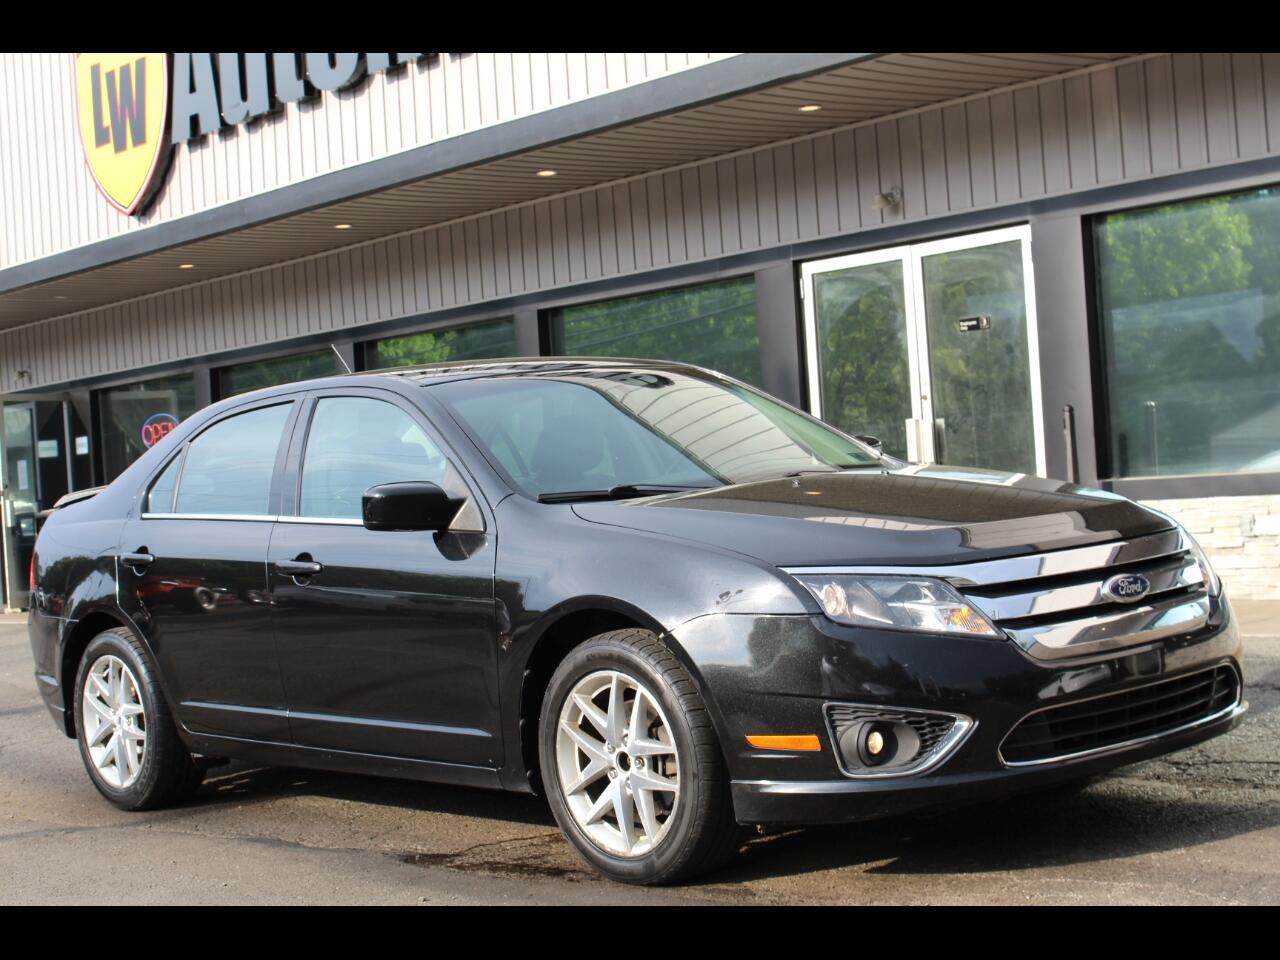 2010 Ford Fusion V6 SEL